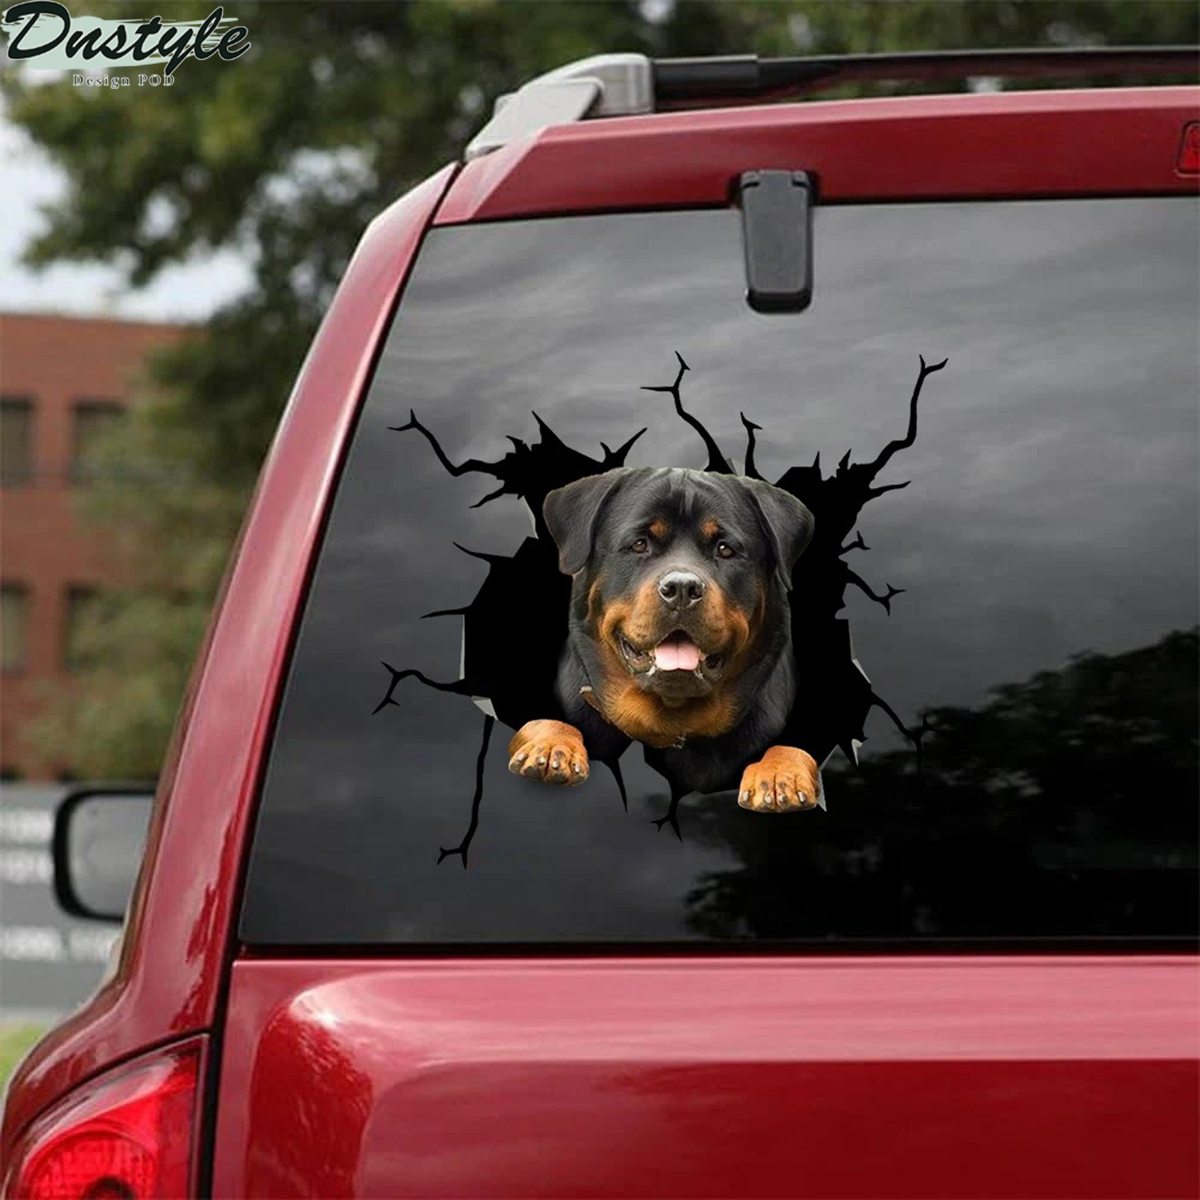 Funny rottweiler crack car decal sticker 1